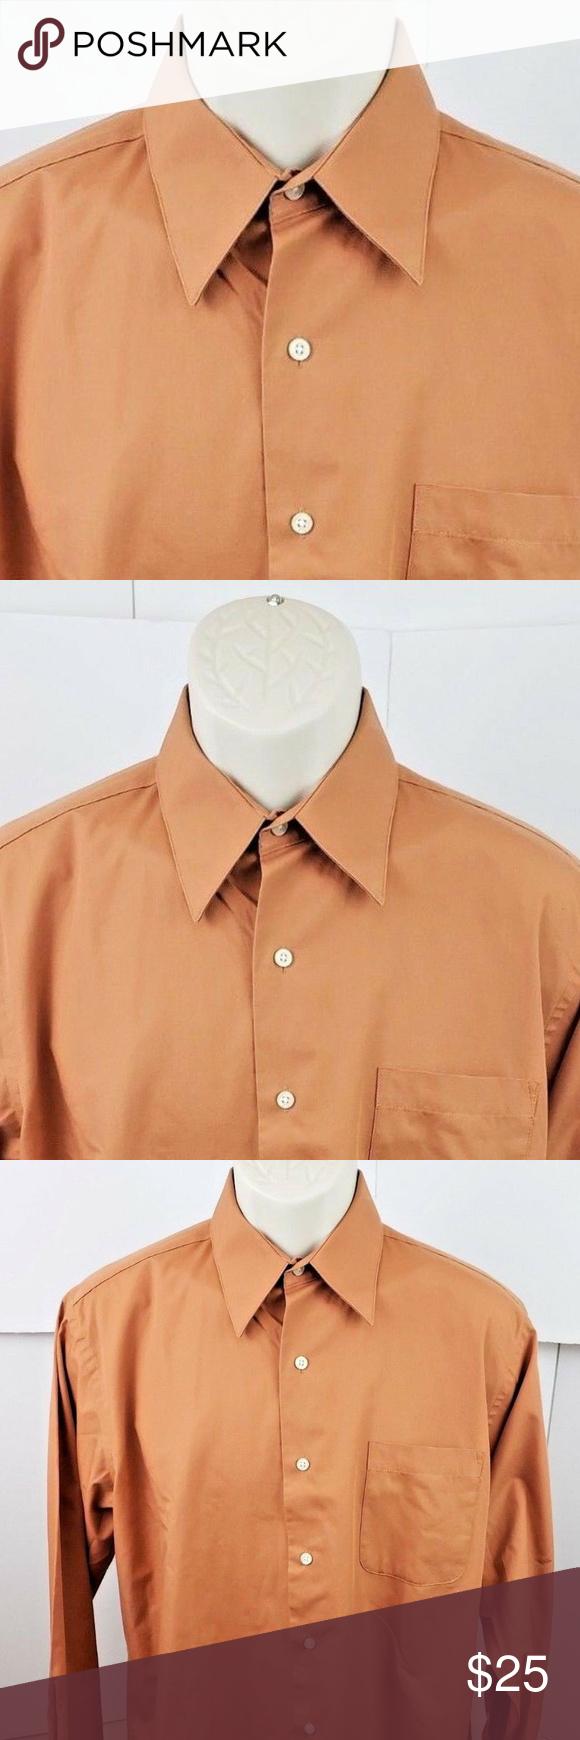 Covington Long Sleeve Dress Shirt 15 15 5 32 33 M Long Sleeve Shirt Dress Shirt Dress Shirts [ 1740 x 580 Pixel ]